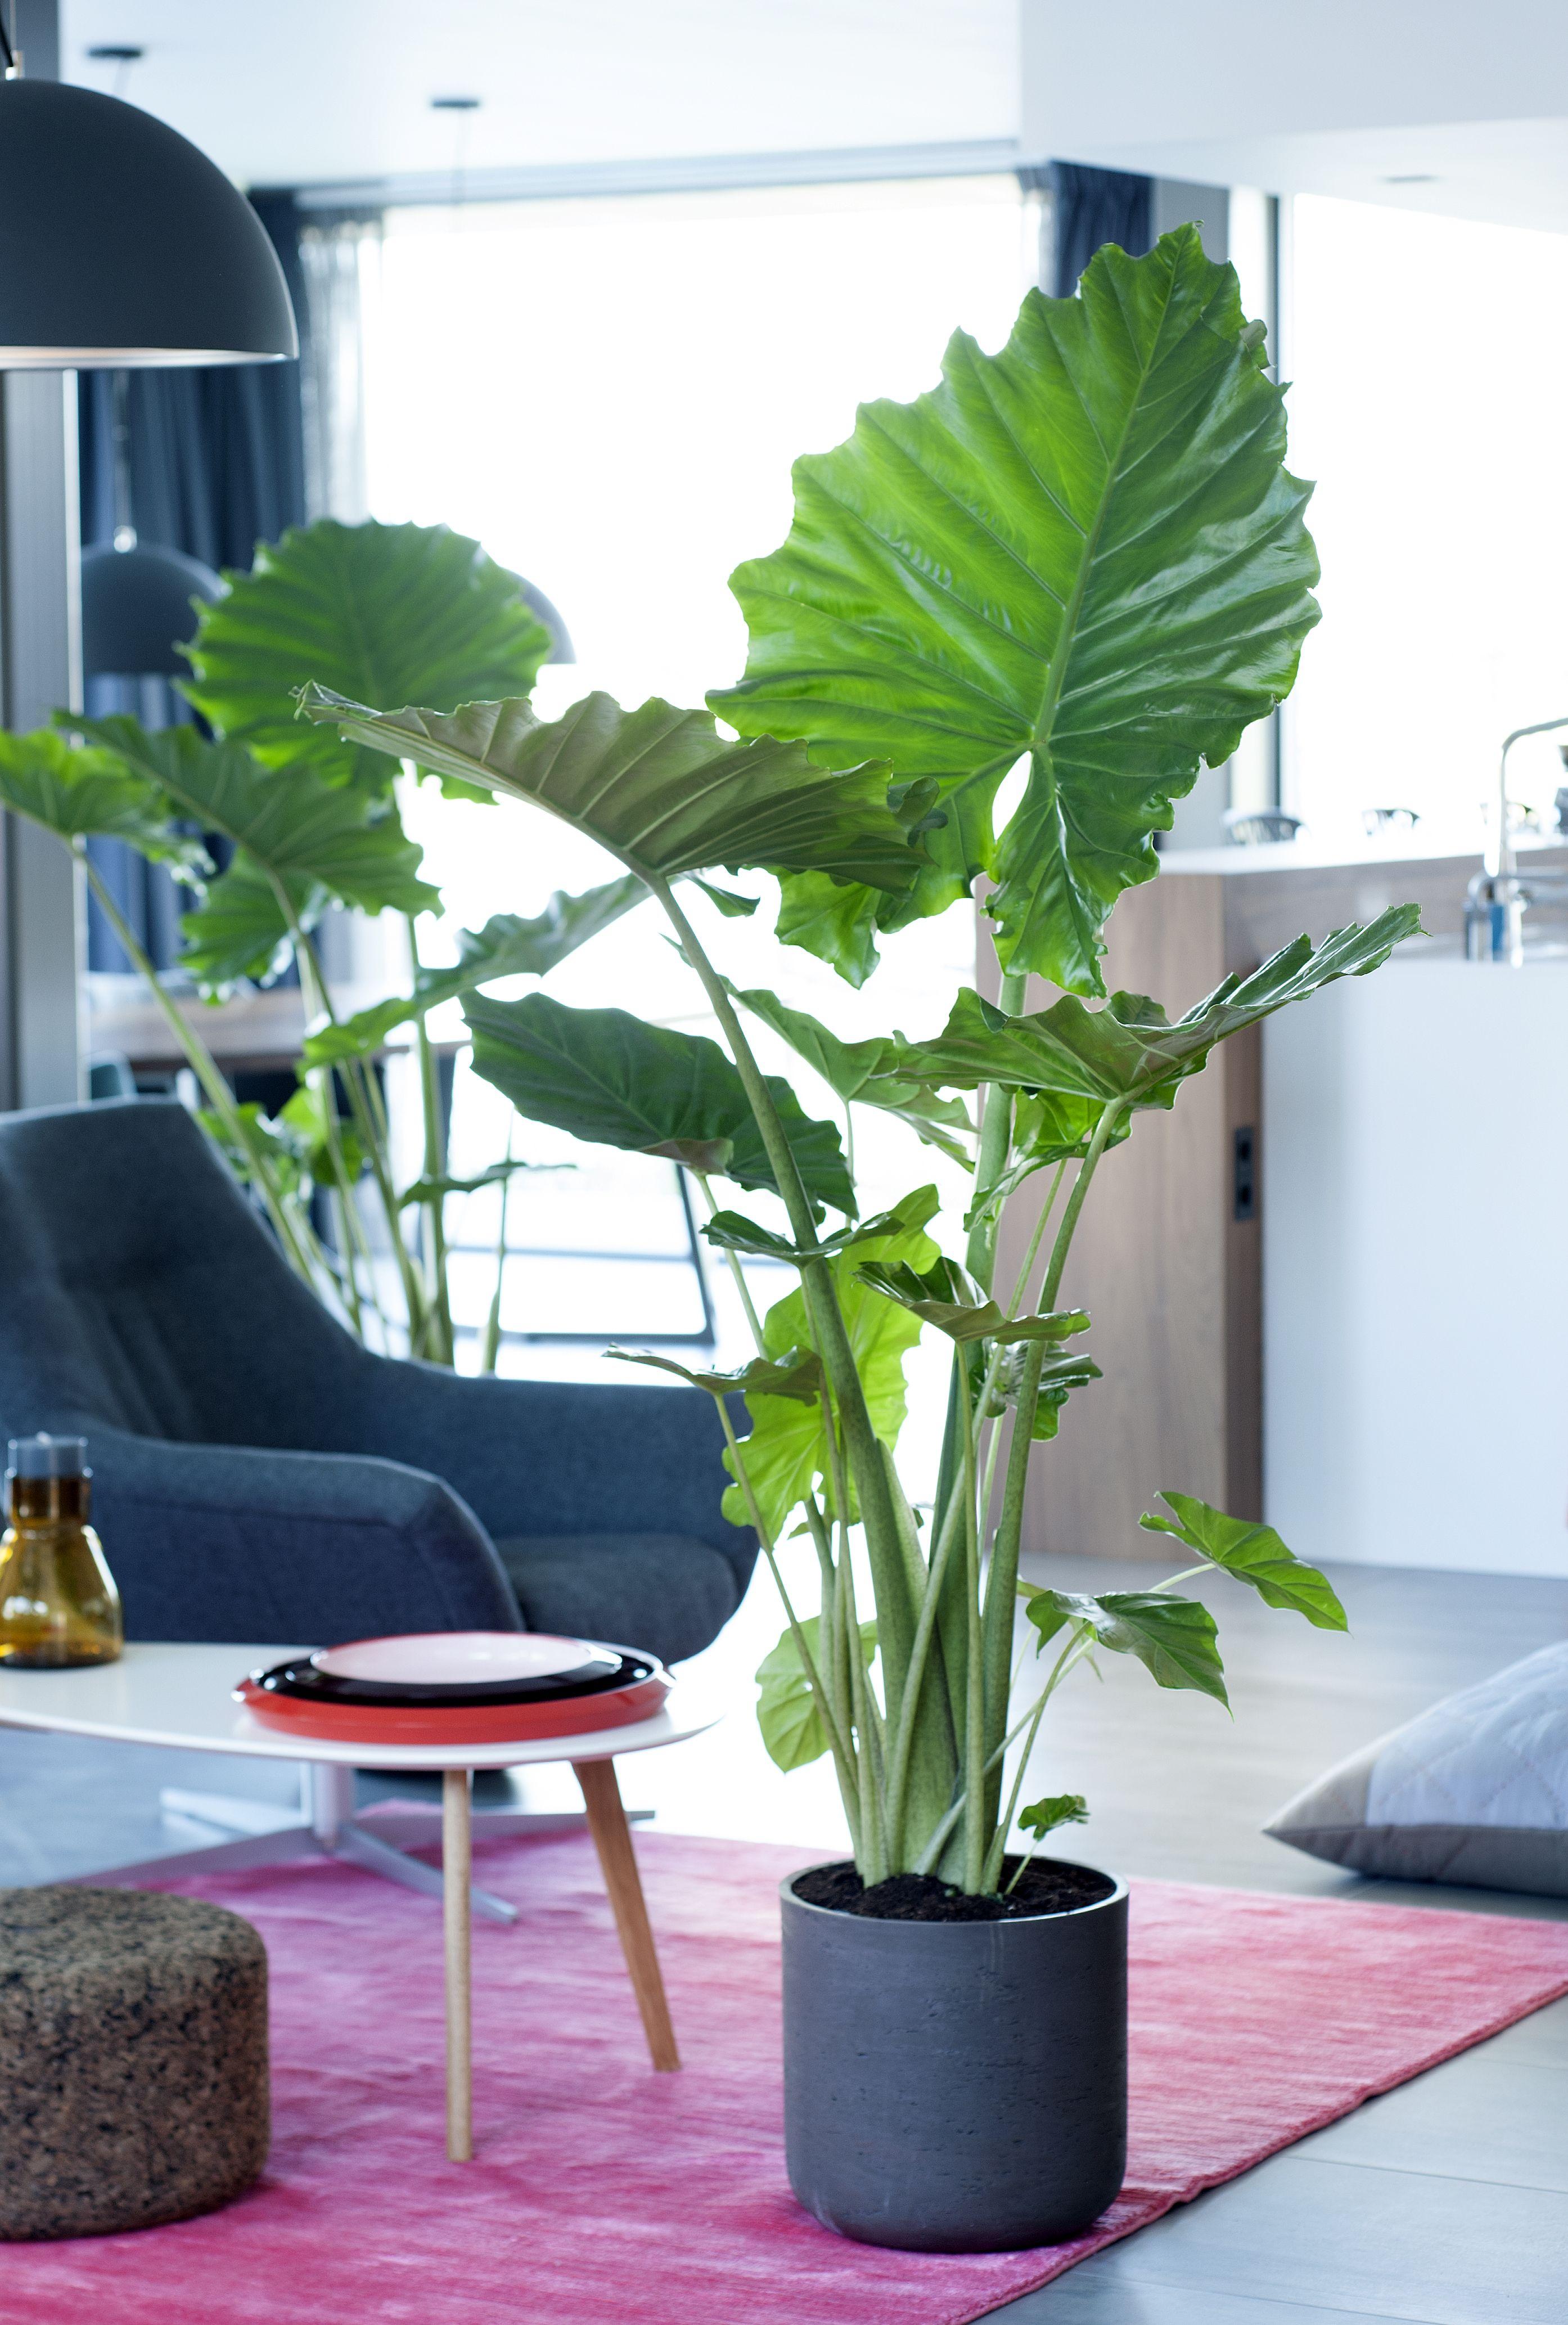 alocasia zen plante inspiration. Black Bedroom Furniture Sets. Home Design Ideas